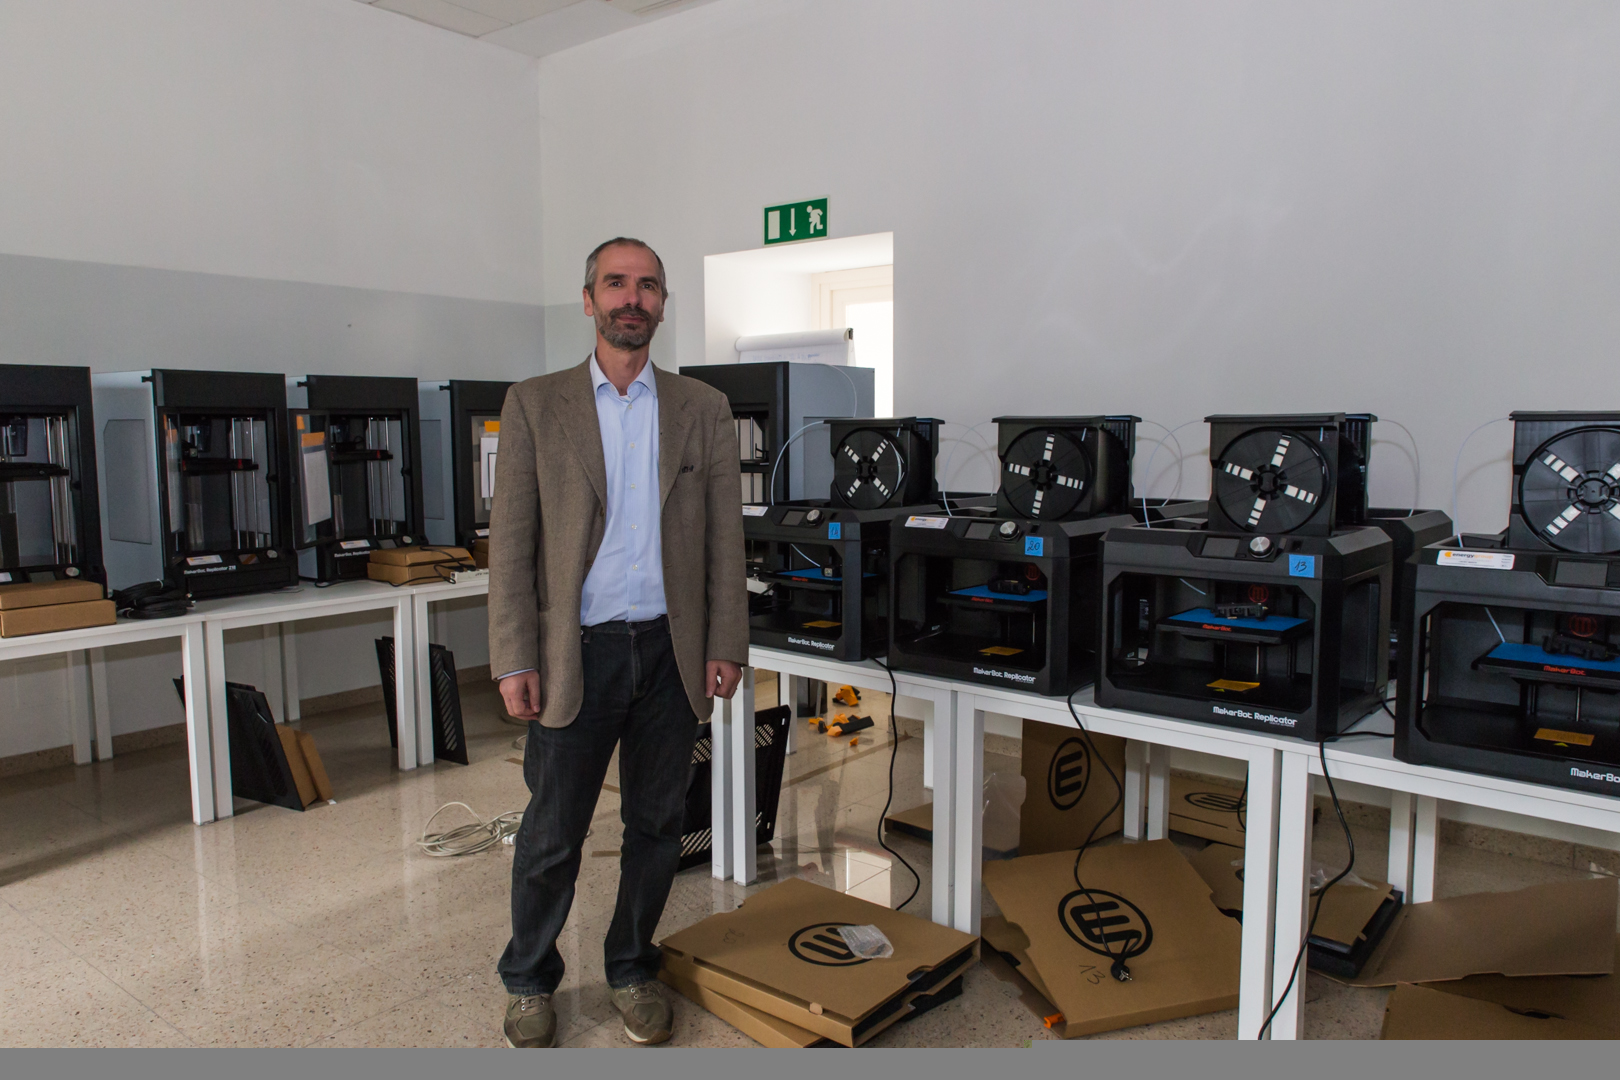 MakerBot_Innovation_Lab_foto_di_Alberto_Caielli13